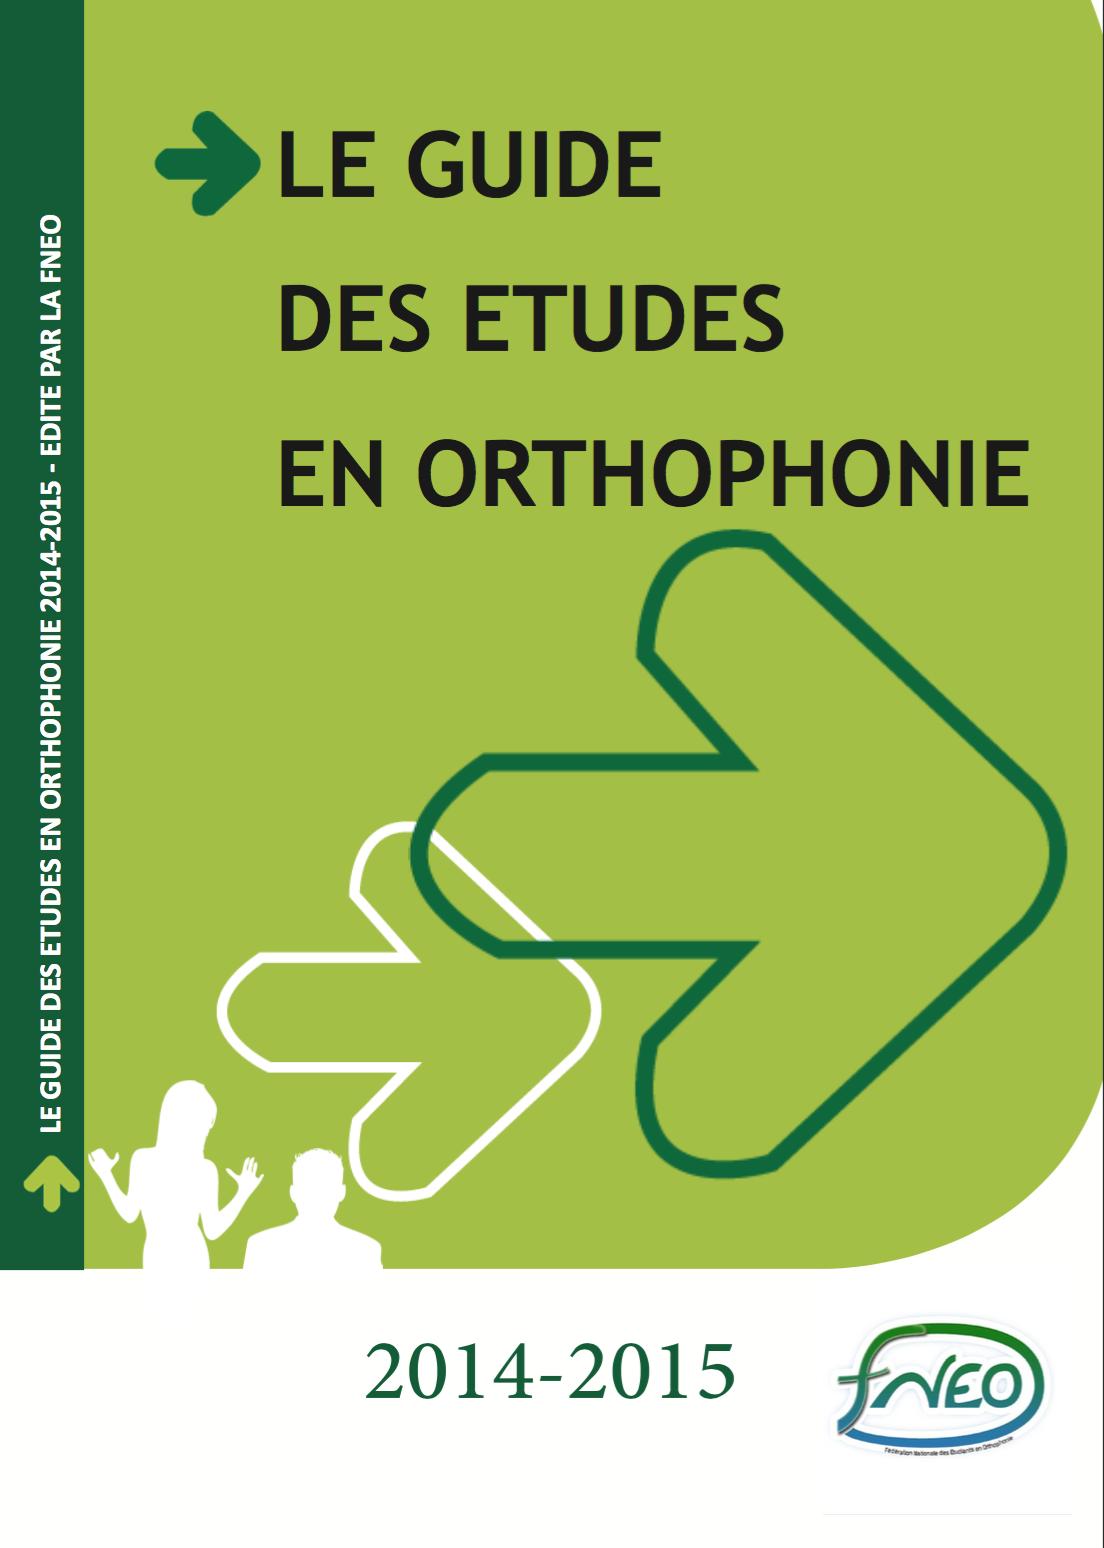 bourse etudiant orthophonie